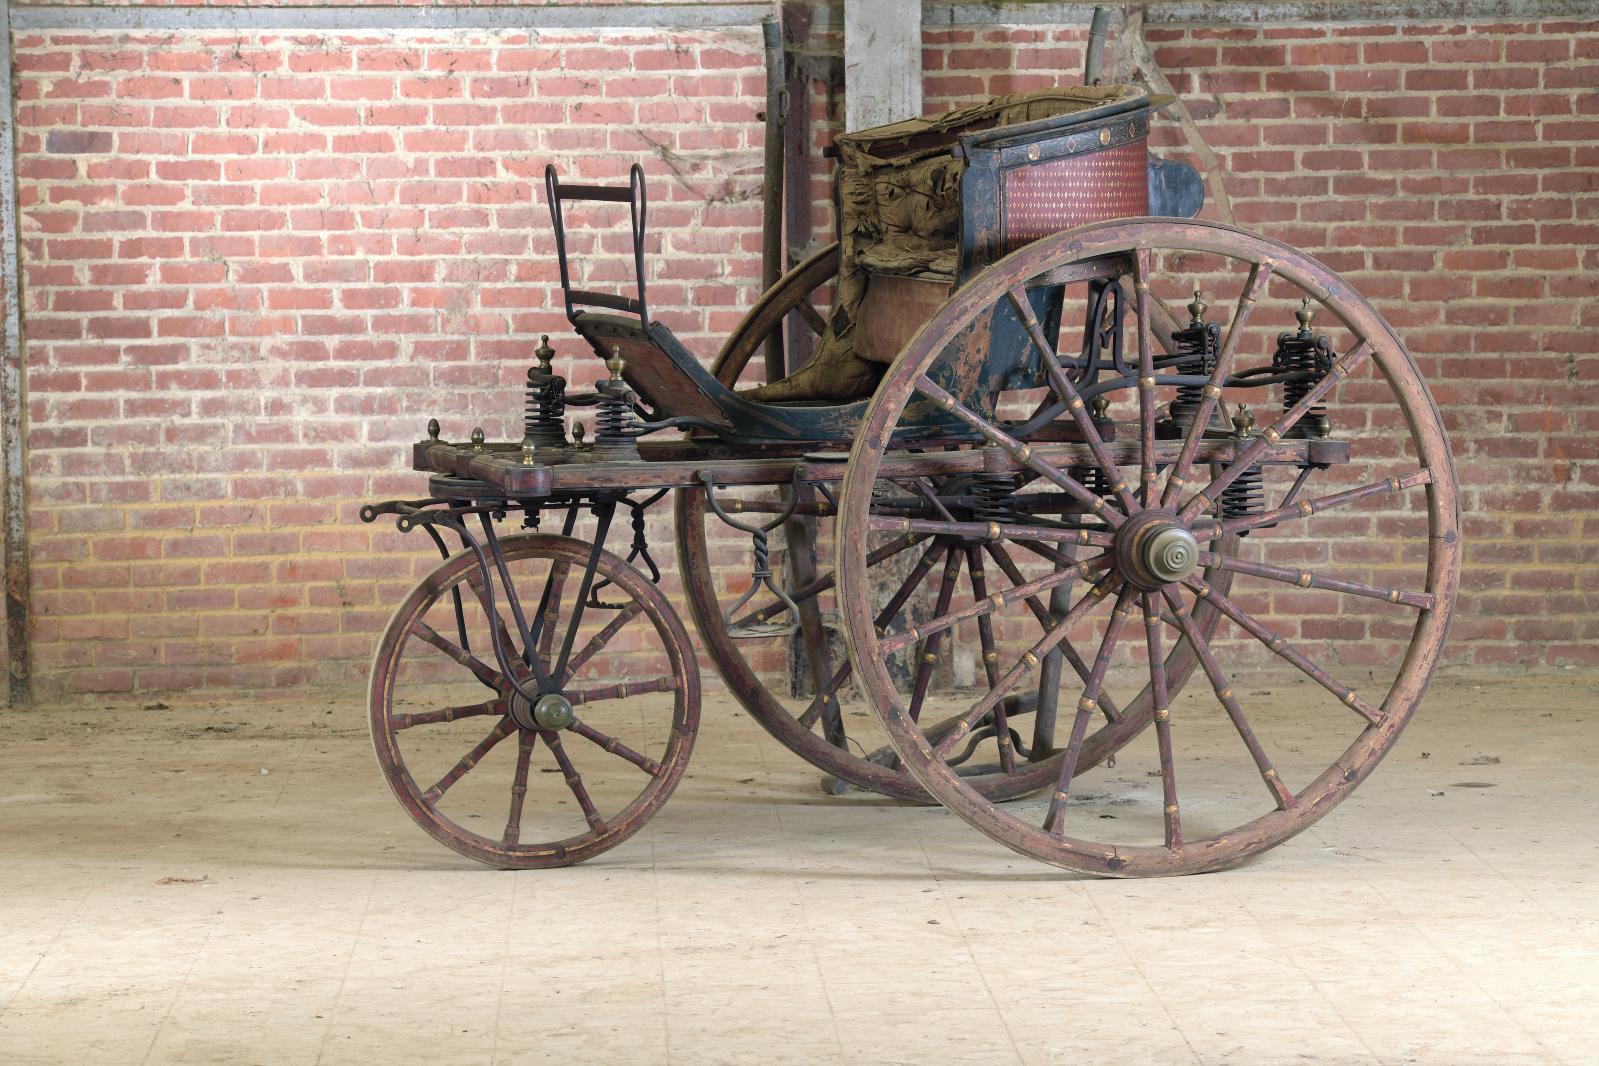 trirote three-wheeled carriage, c. 1800, built in Pavia, Italy by Antonio Bottigella, 171 x 230 x 160 cm/67.32 x 90.55 x 62.99 in.Estimate